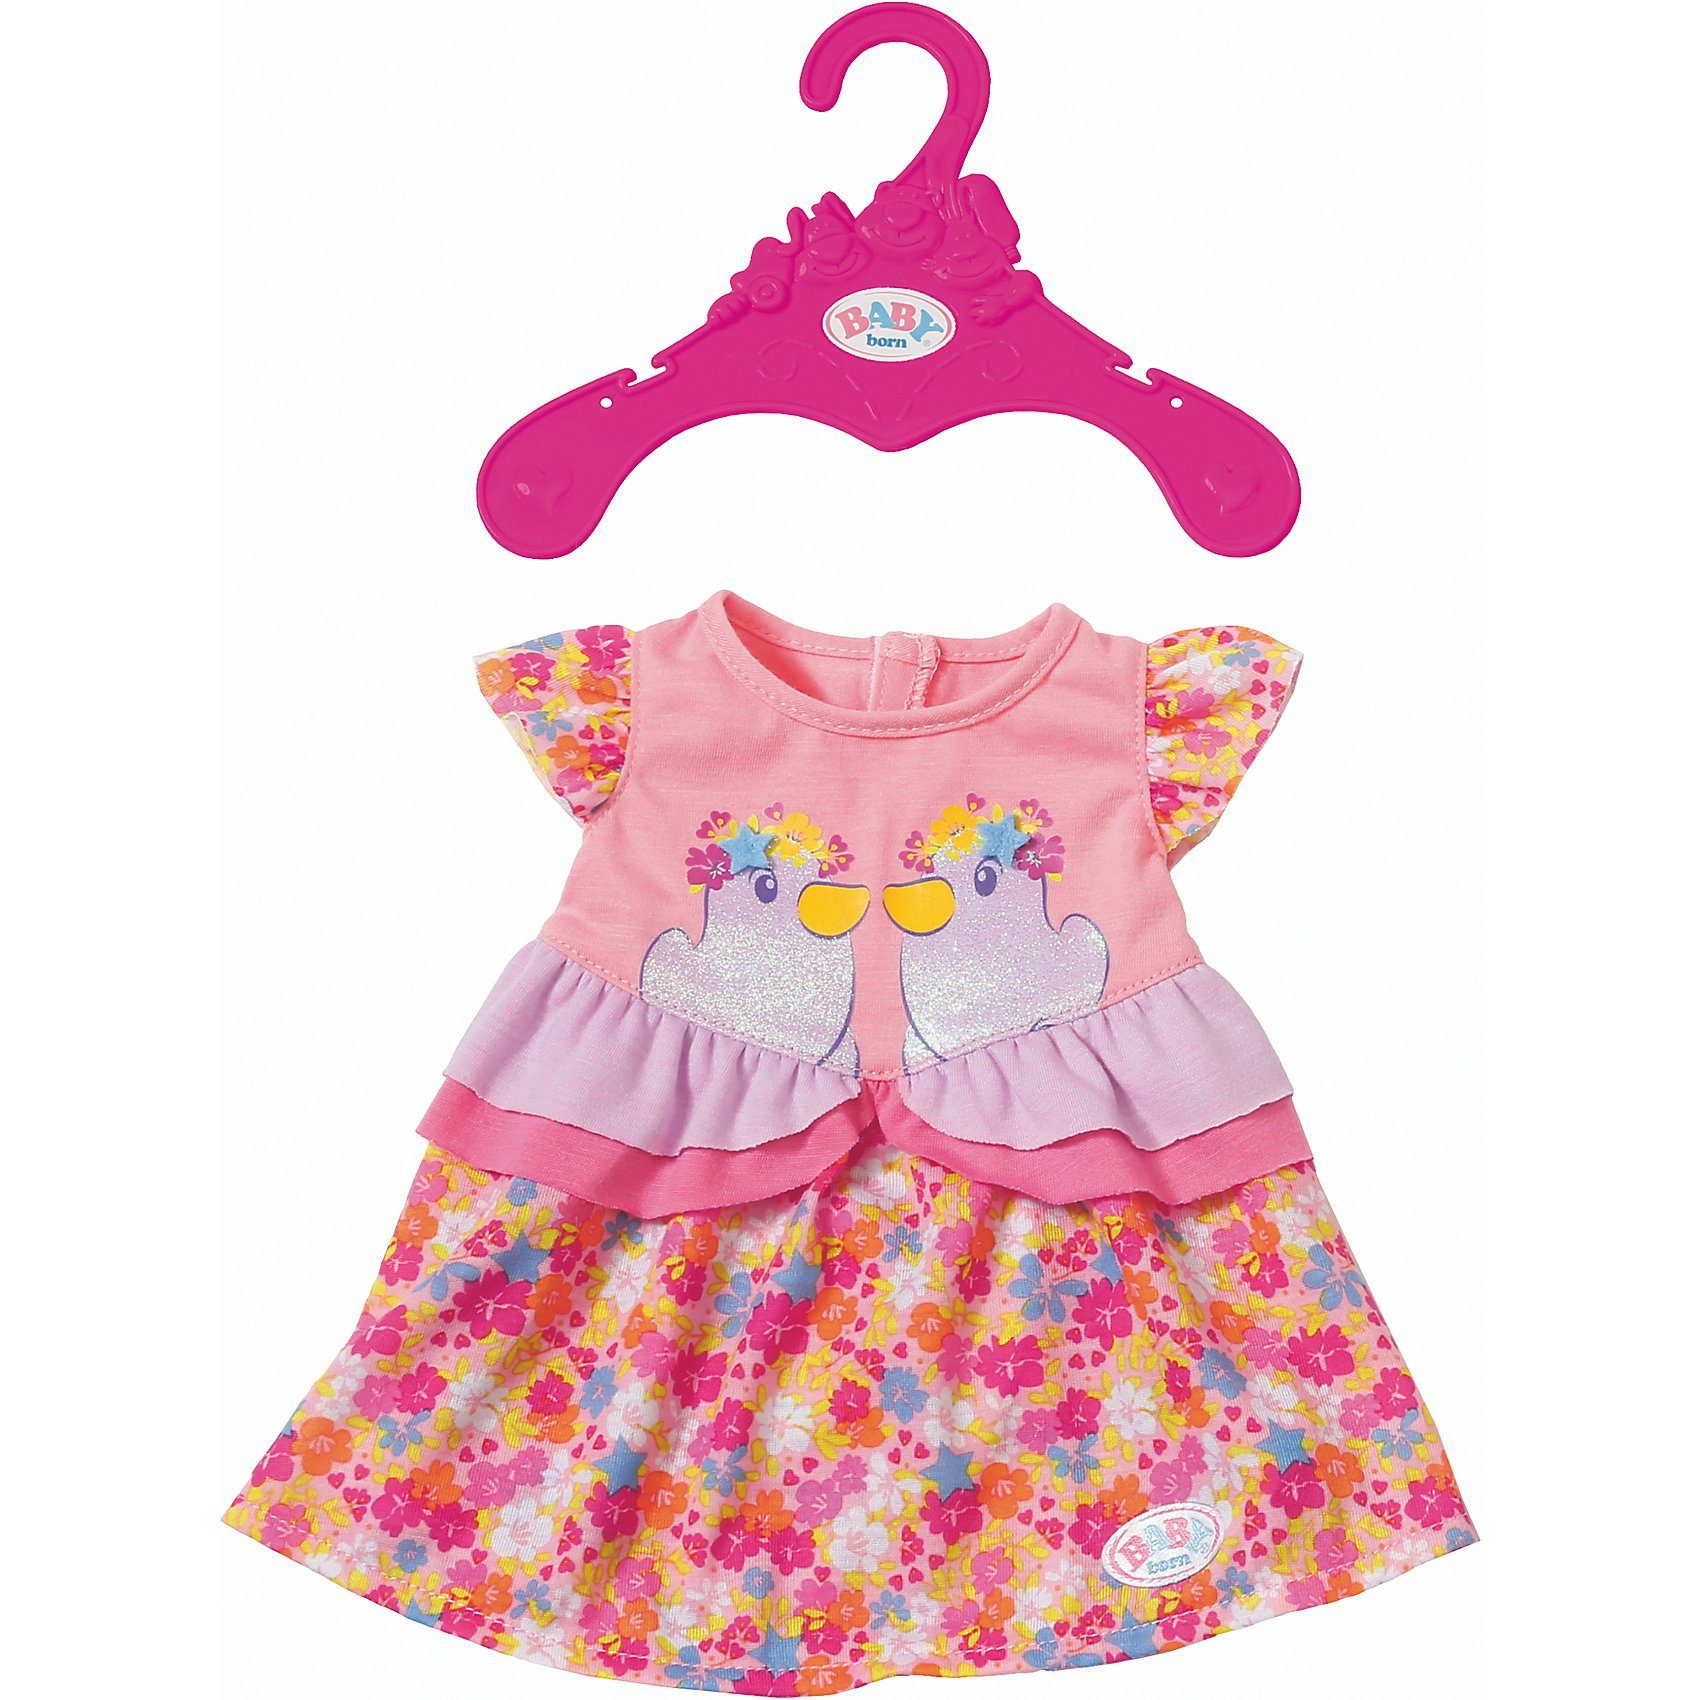 Zapf Creation® BABY born® Kleider Kollektion Gemustert